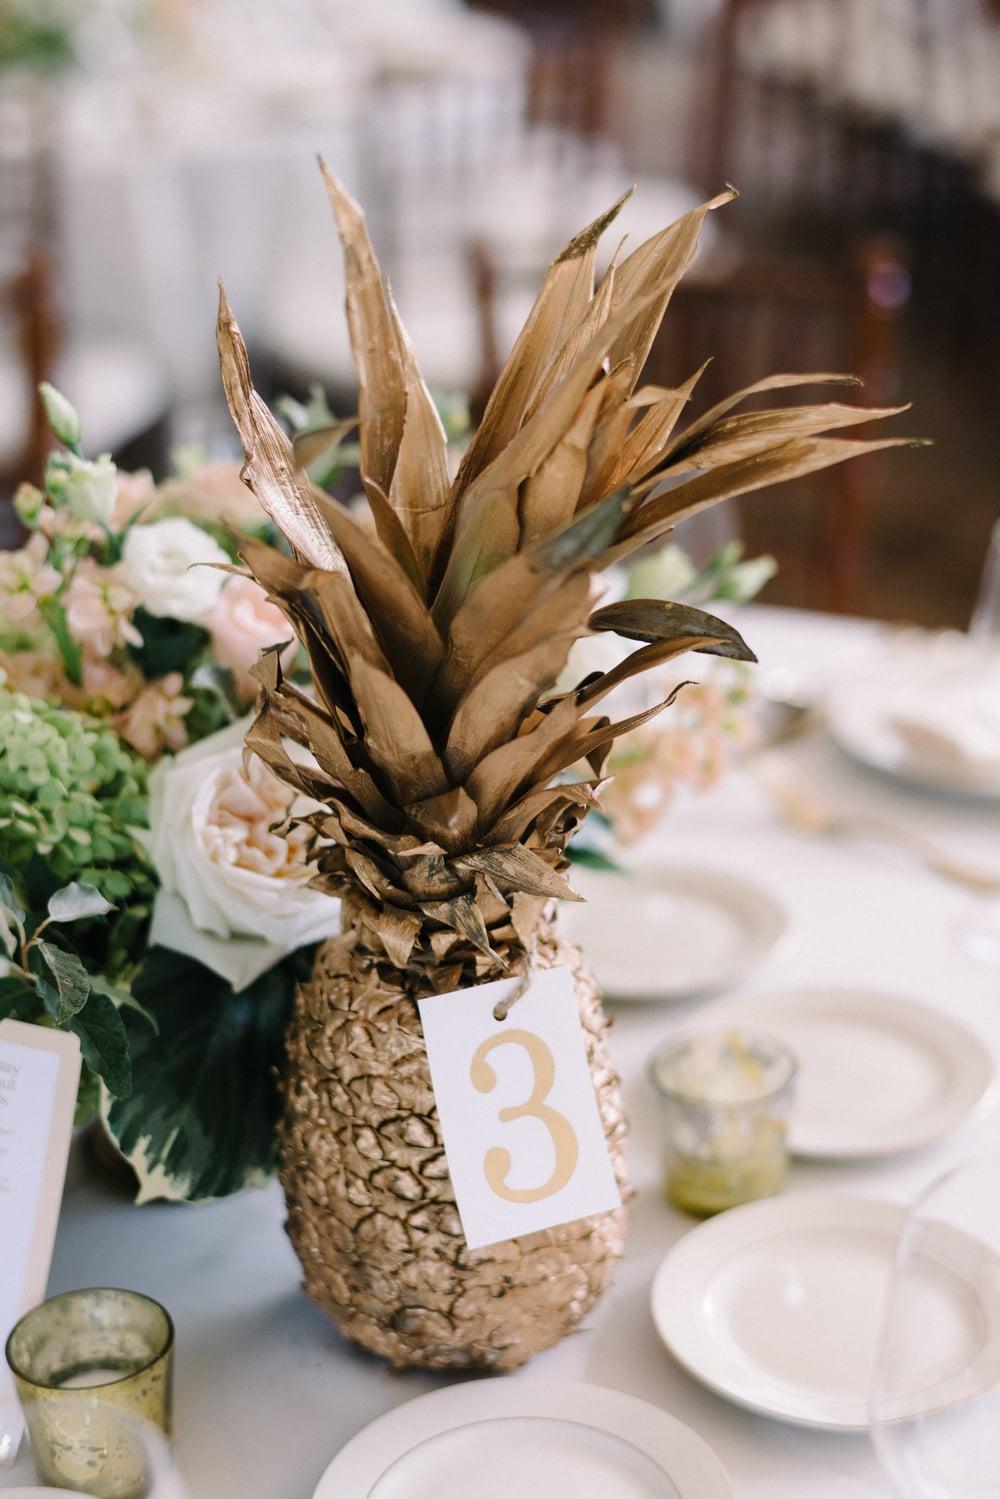 A Garden Party Florist, Inn at Fernbrook Farms, Michelle Lange Photography, Blush, Table Decor, Pineapple